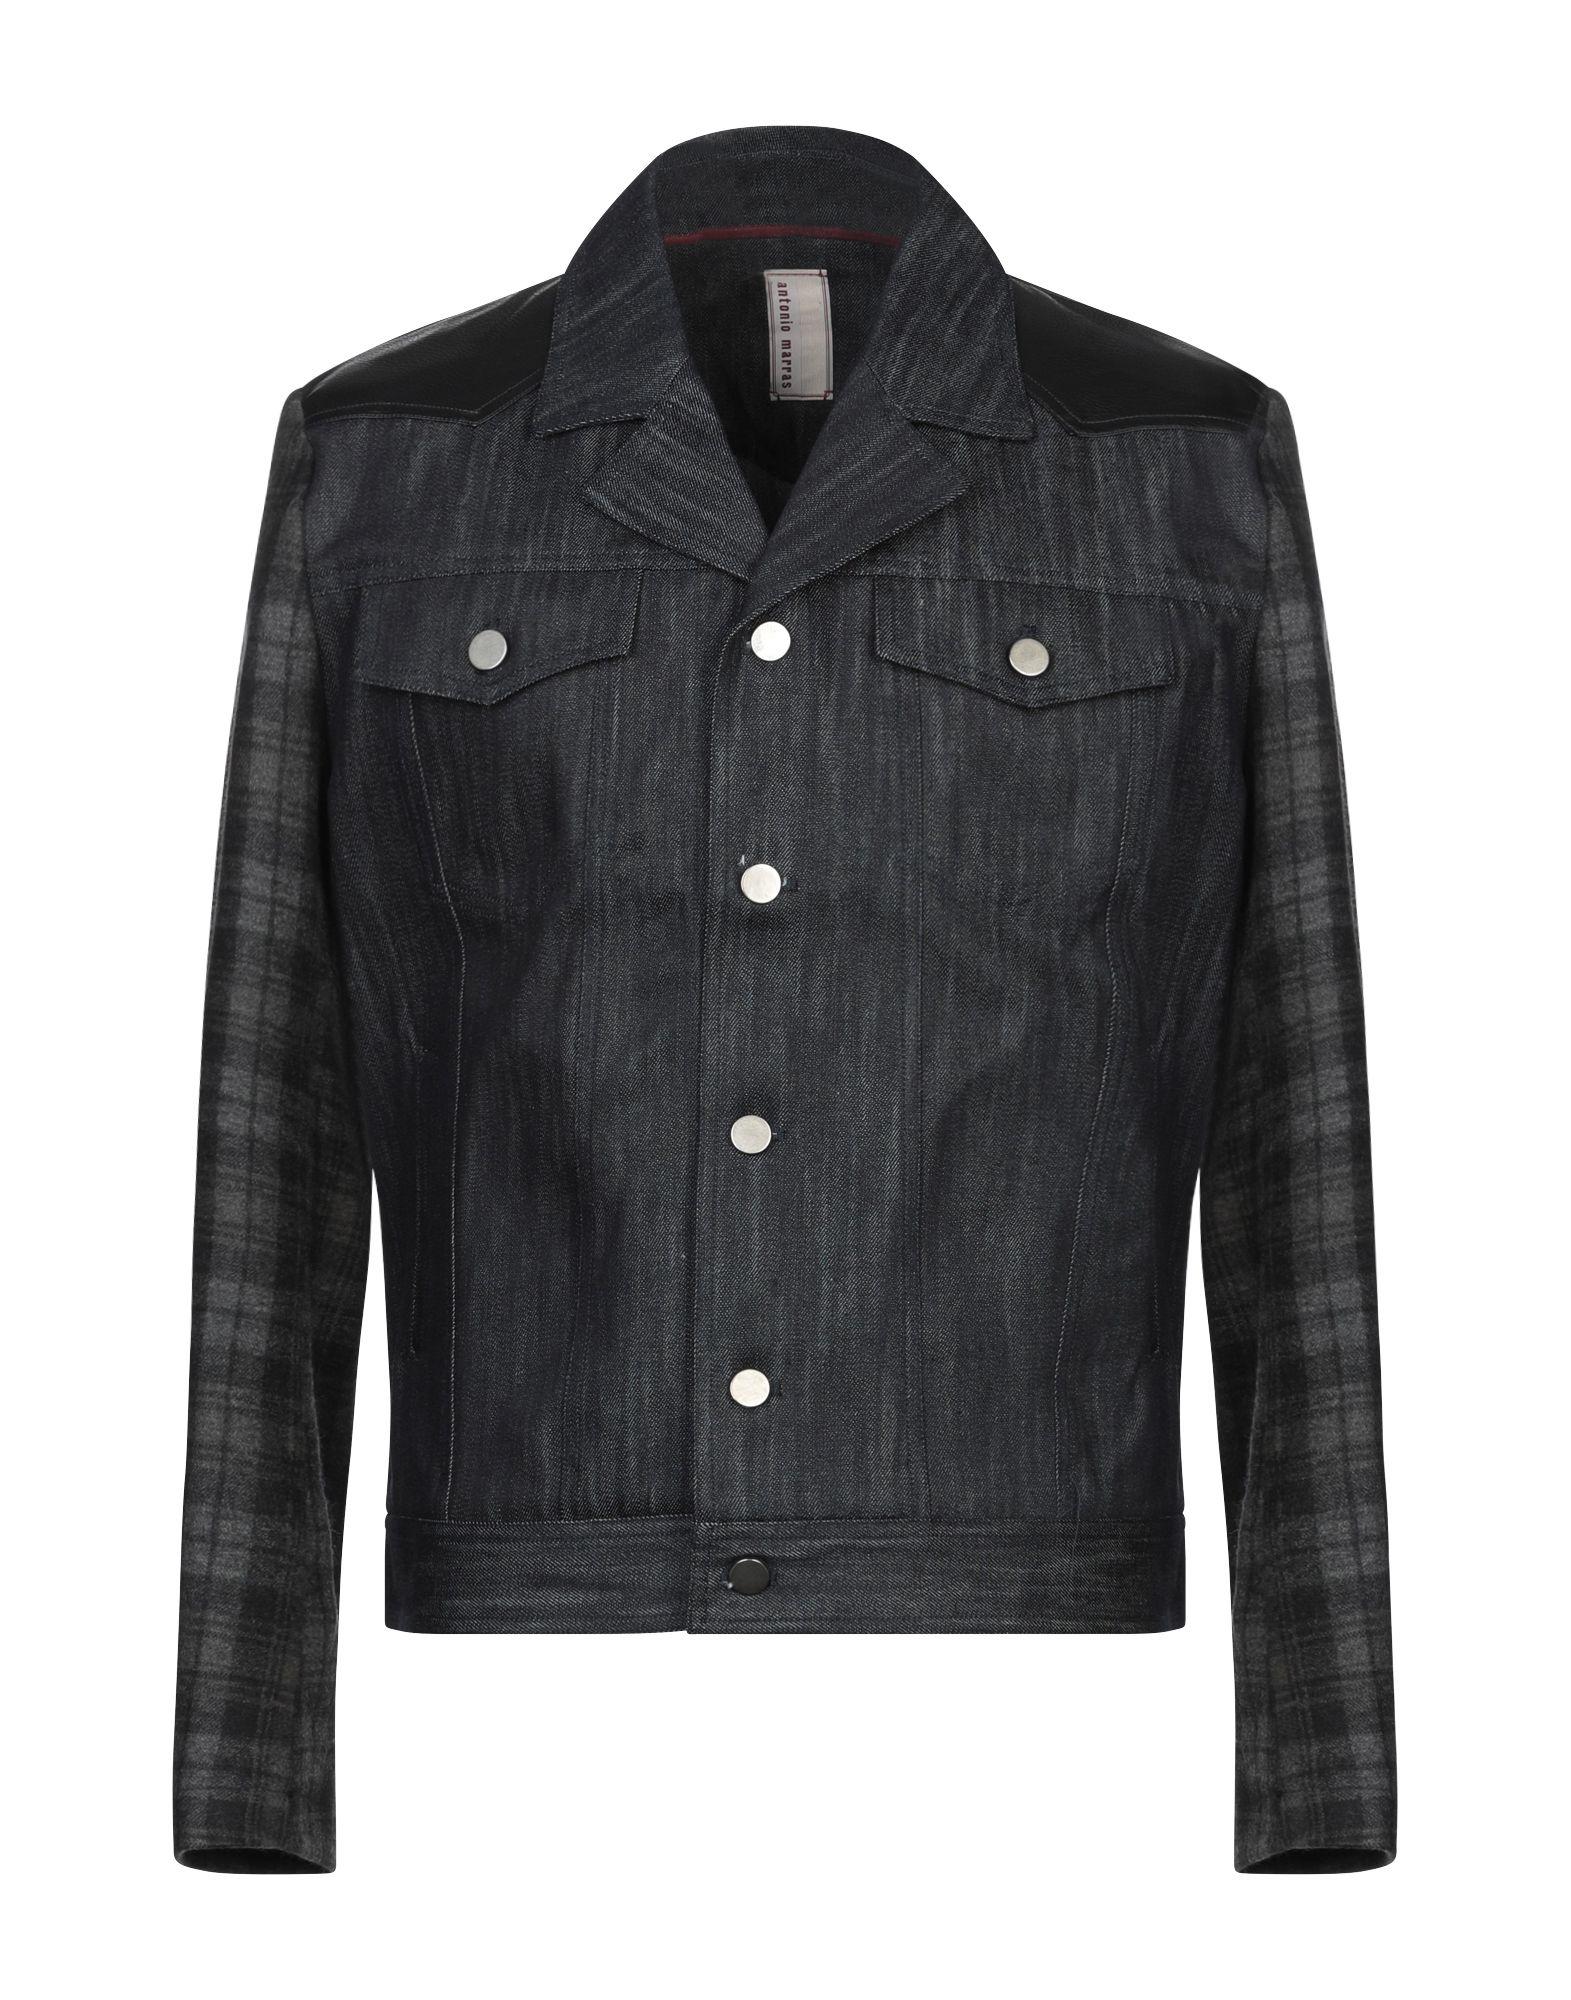 ANTONIO MARRAS Джинсовая верхняя одежда antonio marras джинсовая рубашка